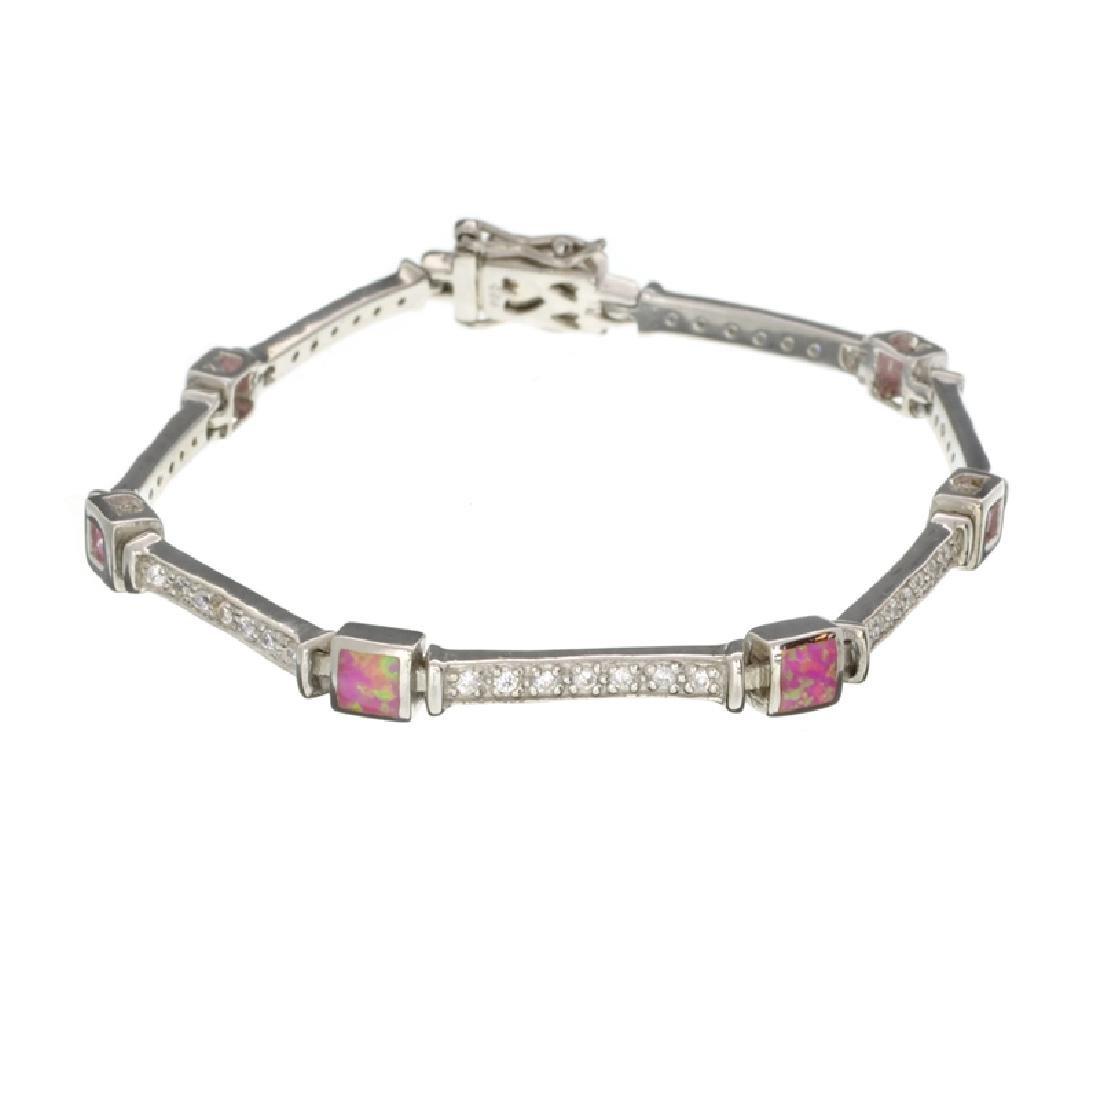 Platinum Over Sterling Silver French Zirconium Bracelet